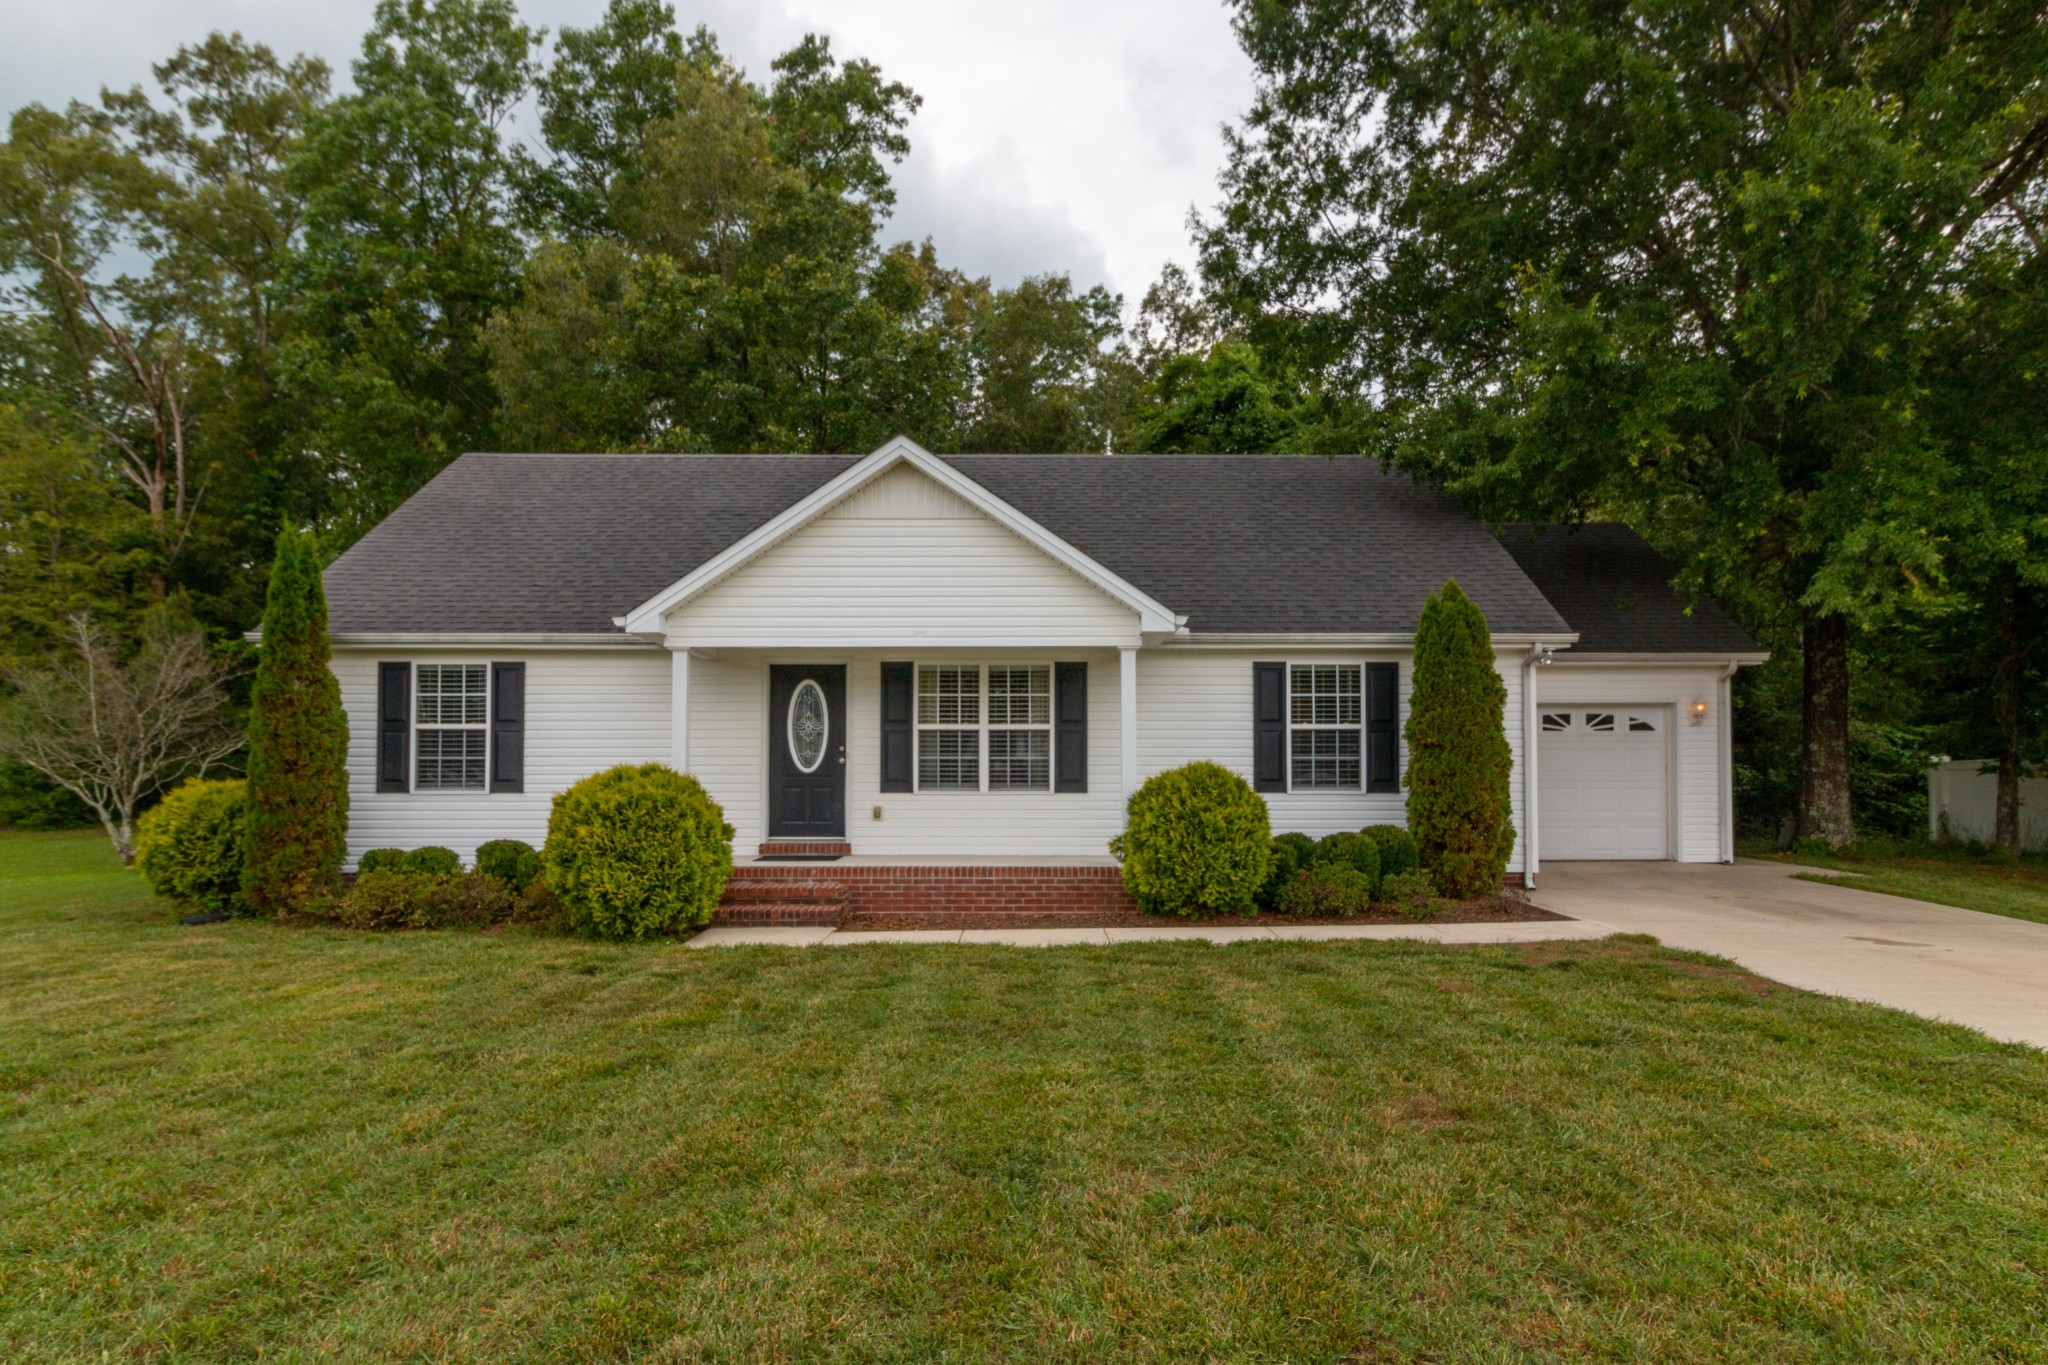 126 Lindsey Cir Property Photo - Tullahoma, TN real estate listing